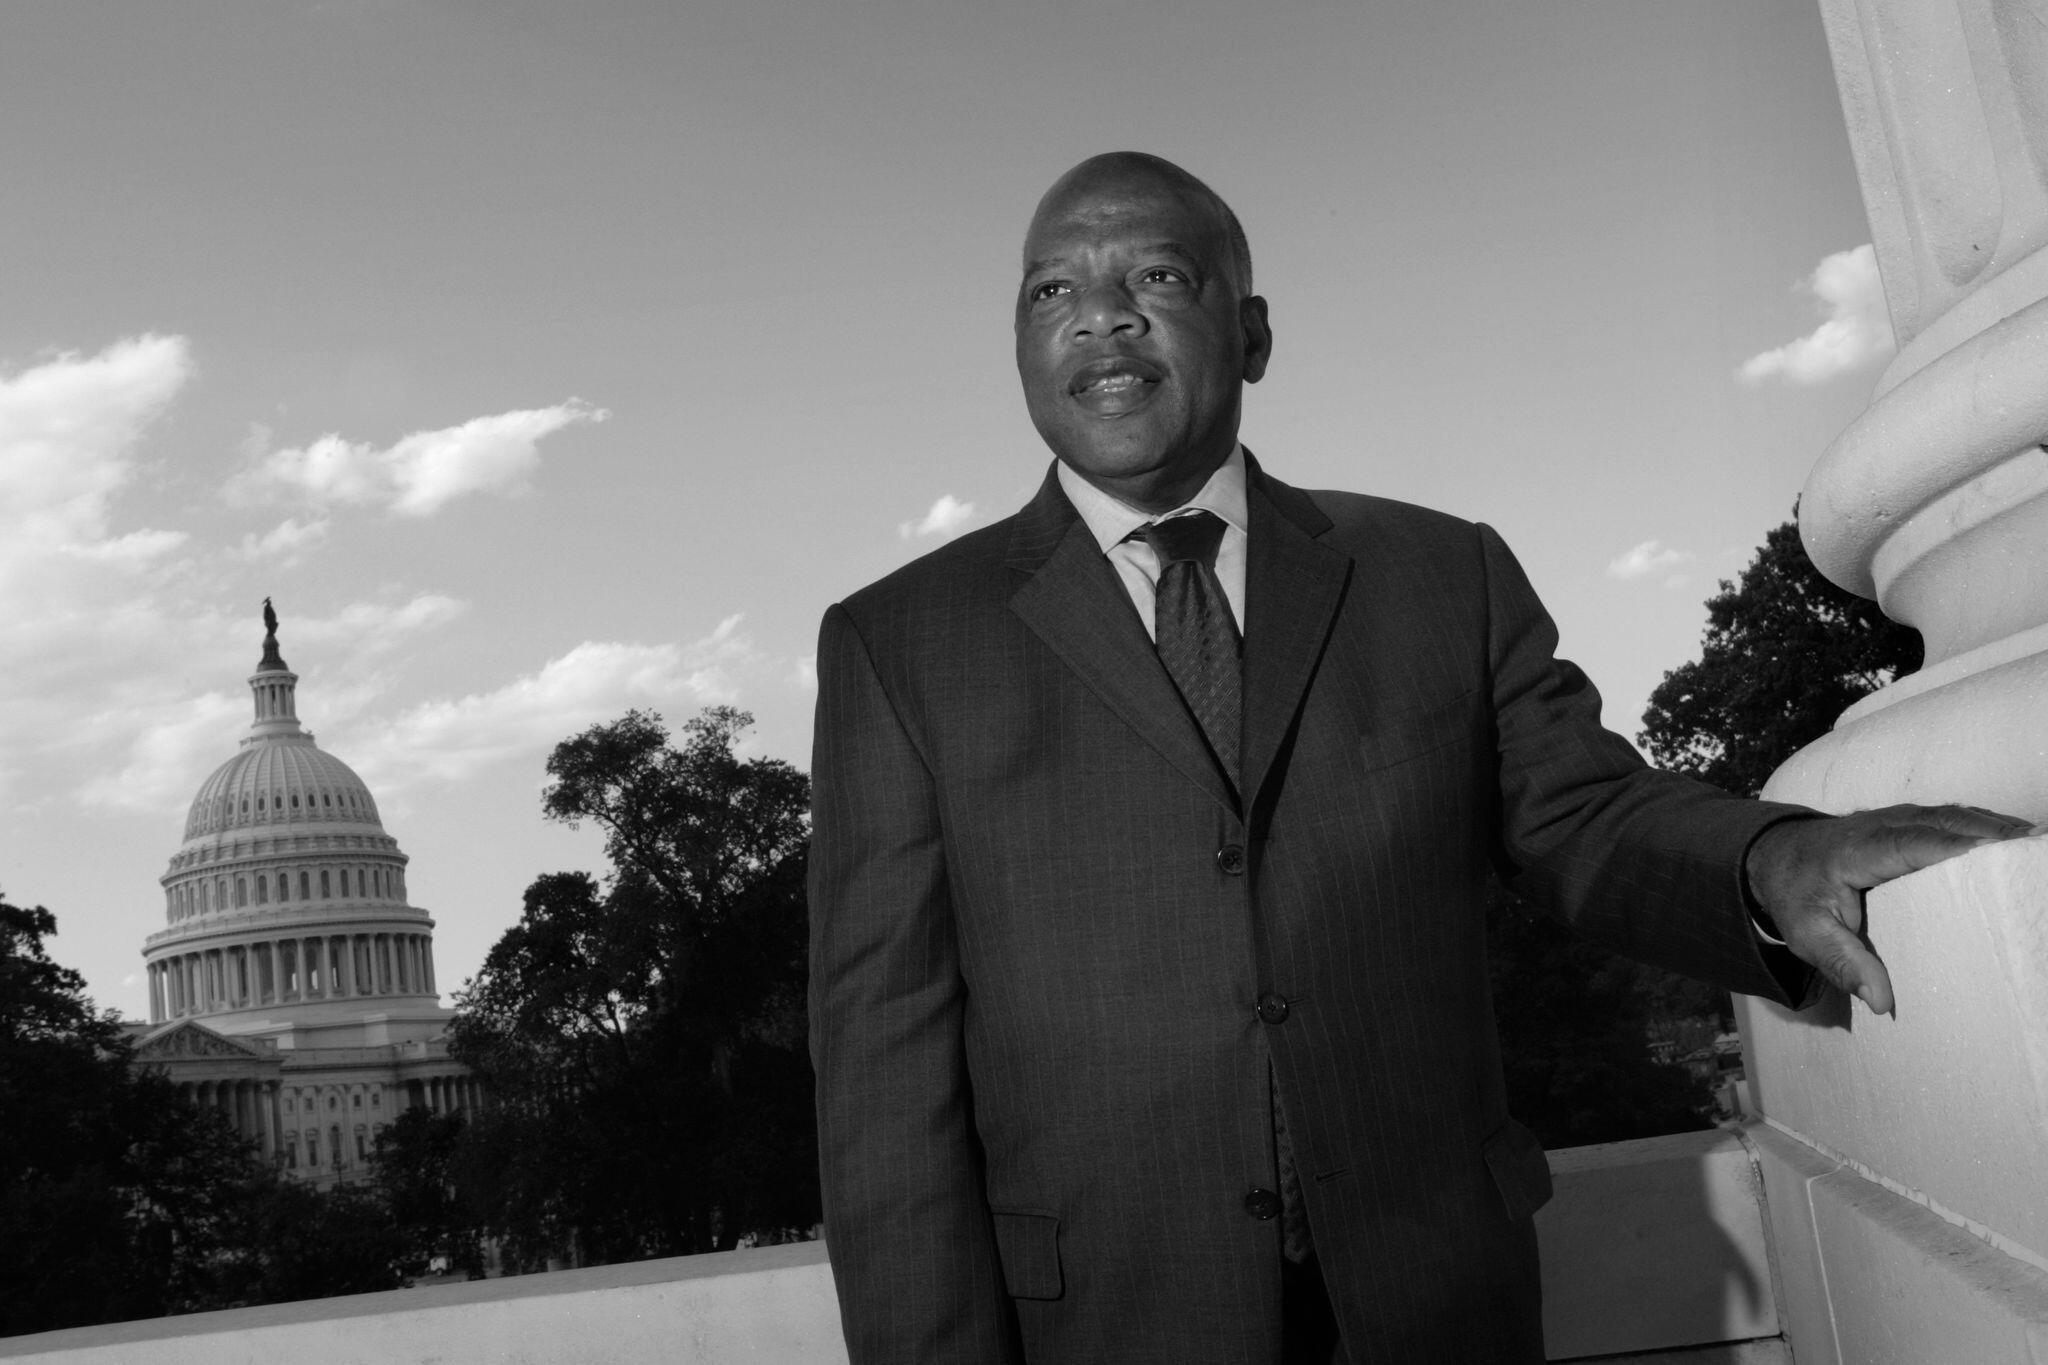 Bild zu US-Bürgerrechtler John Lewis gestorben